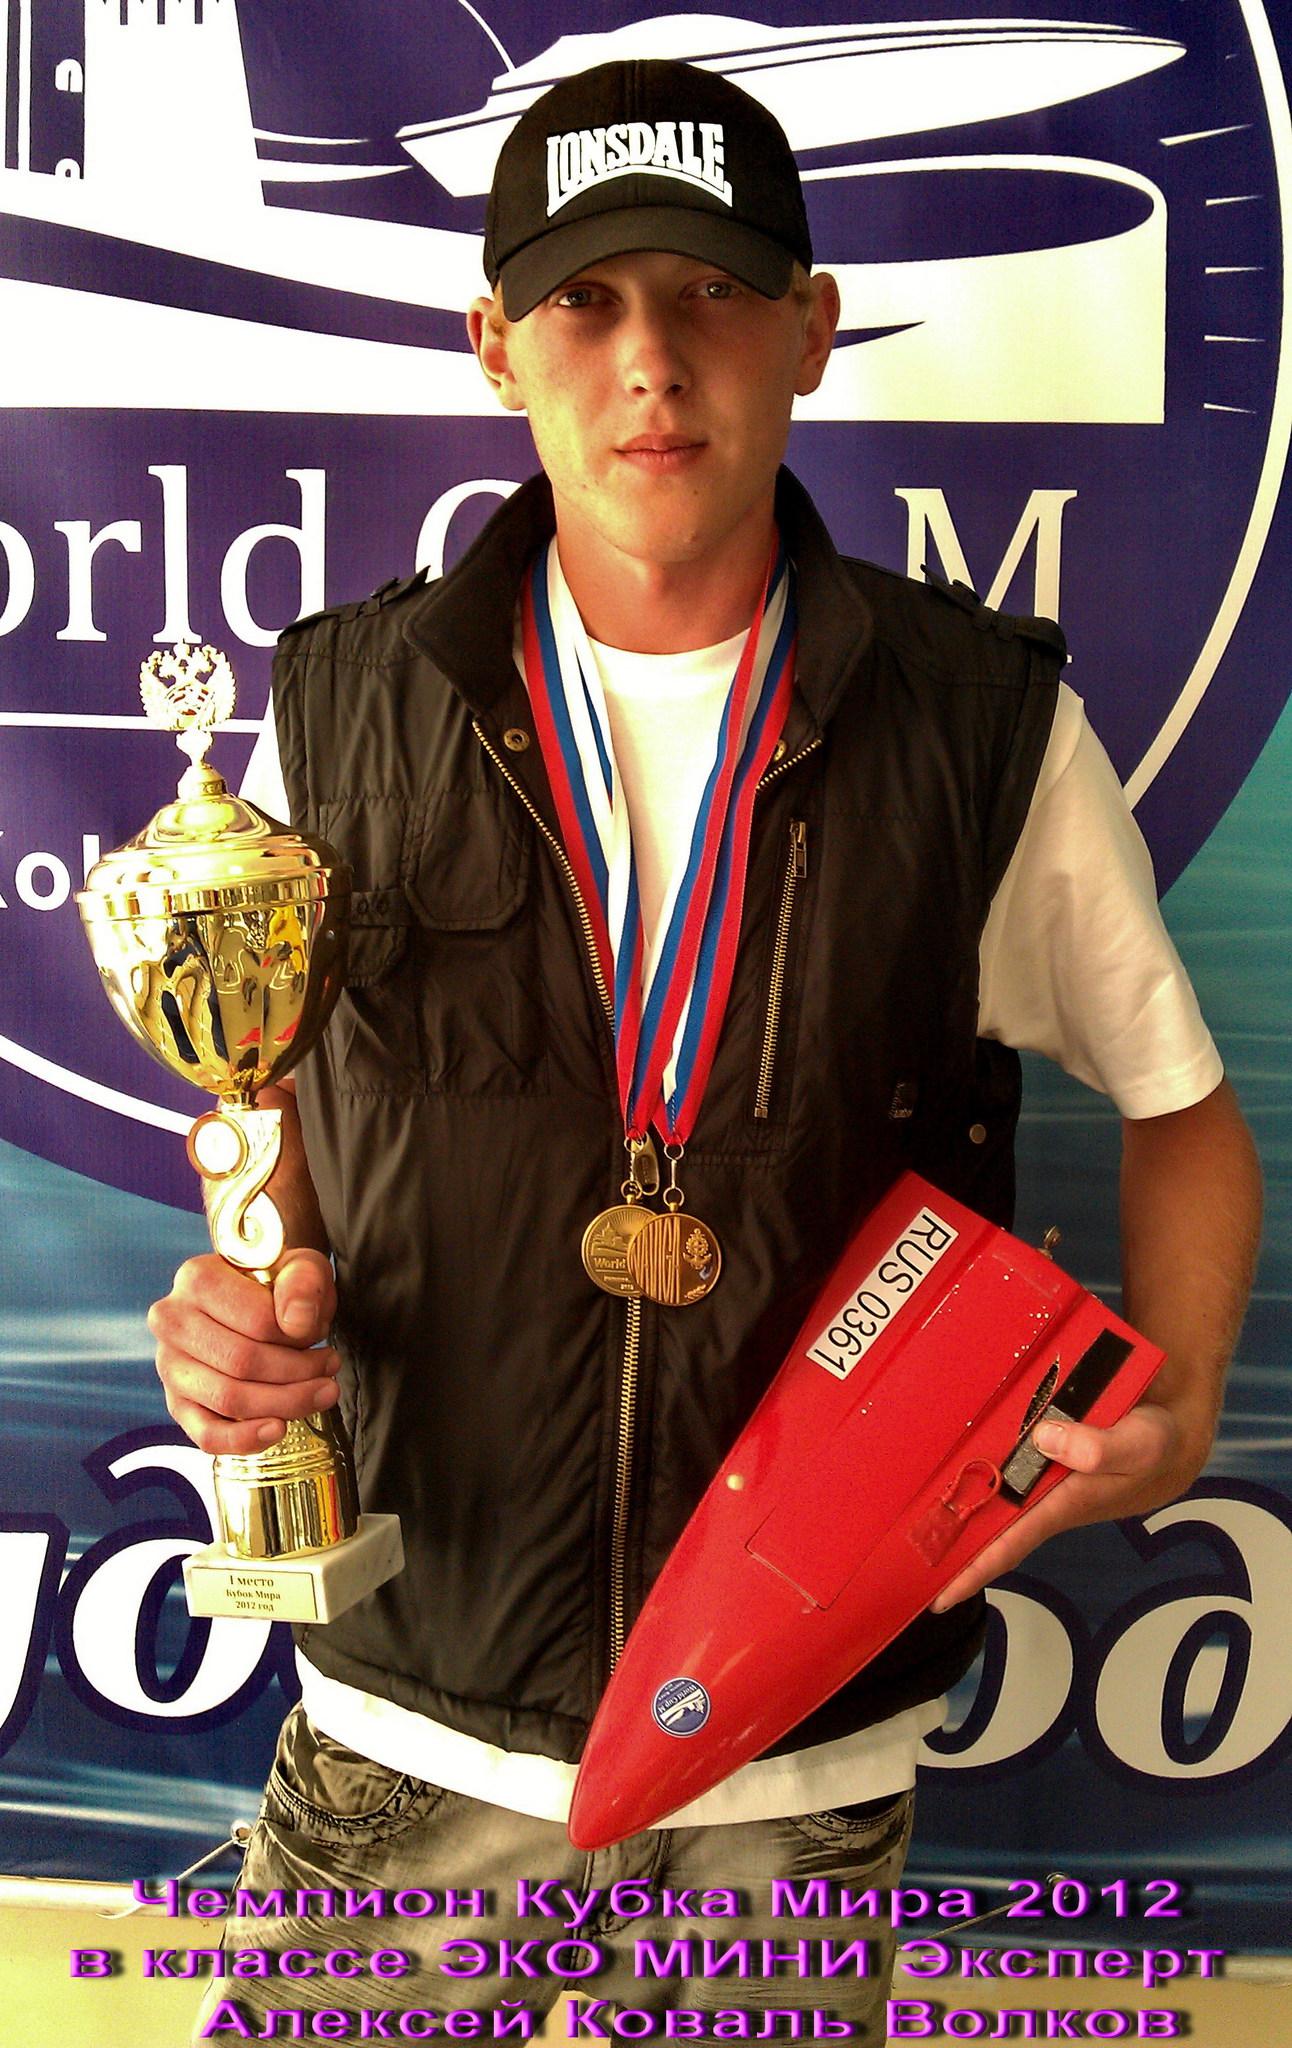 World CUP 2013 winner Alexey Koval Volkov. Russia